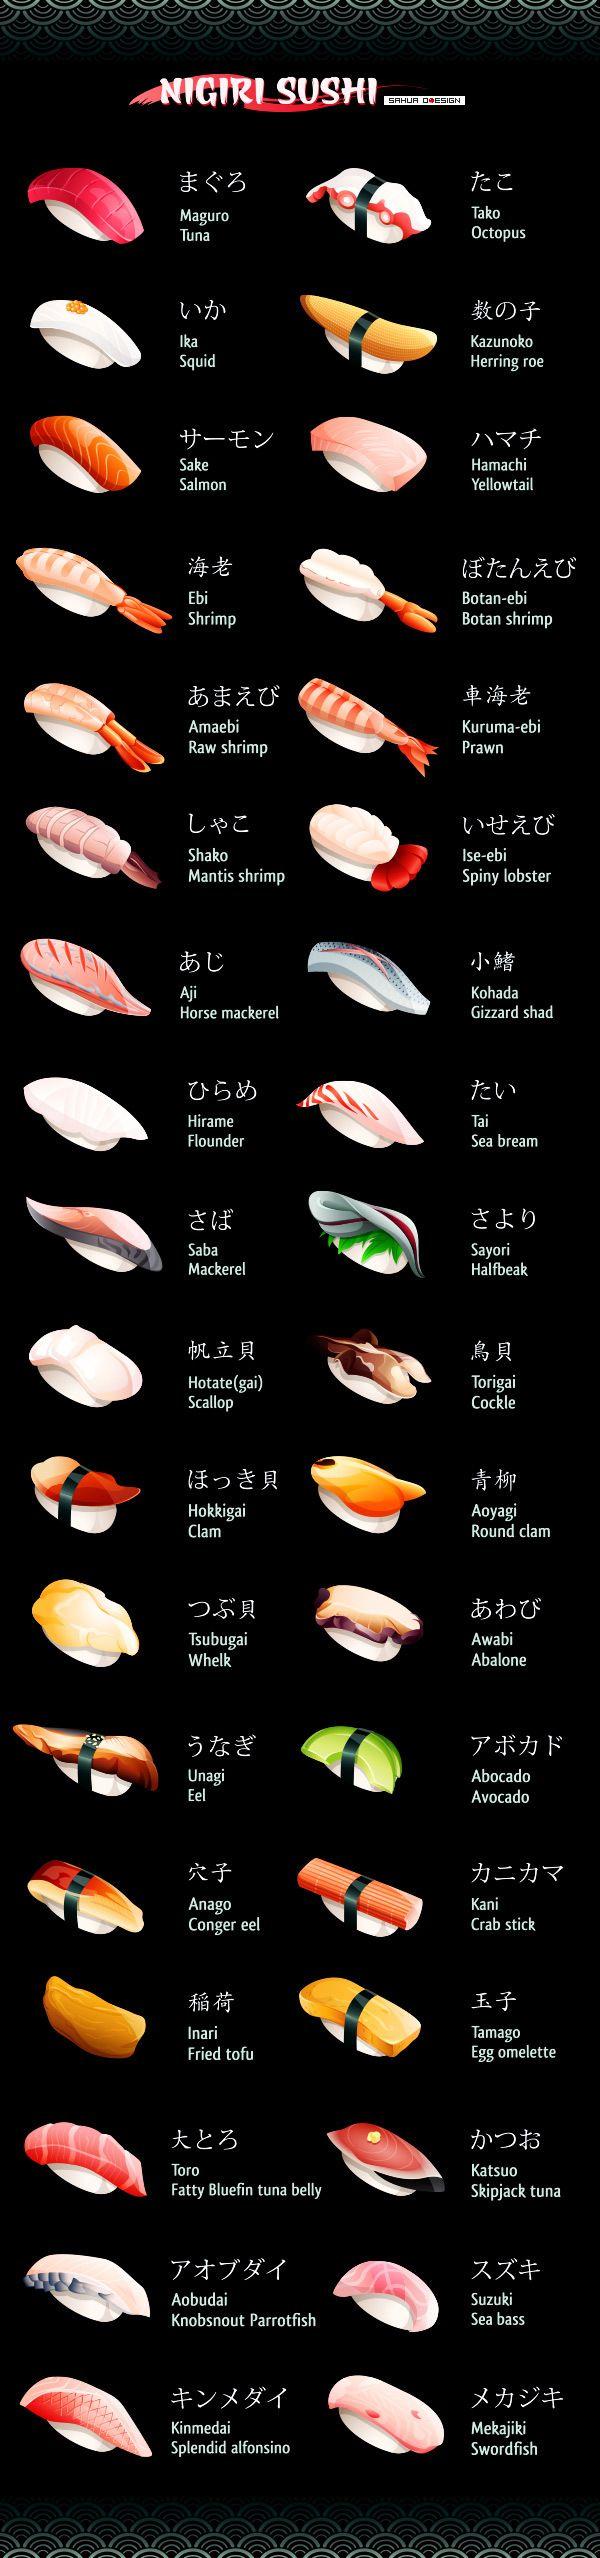 Nigiri Sushi by Sahua #Infographic #Sushi #Nigiri #infografía